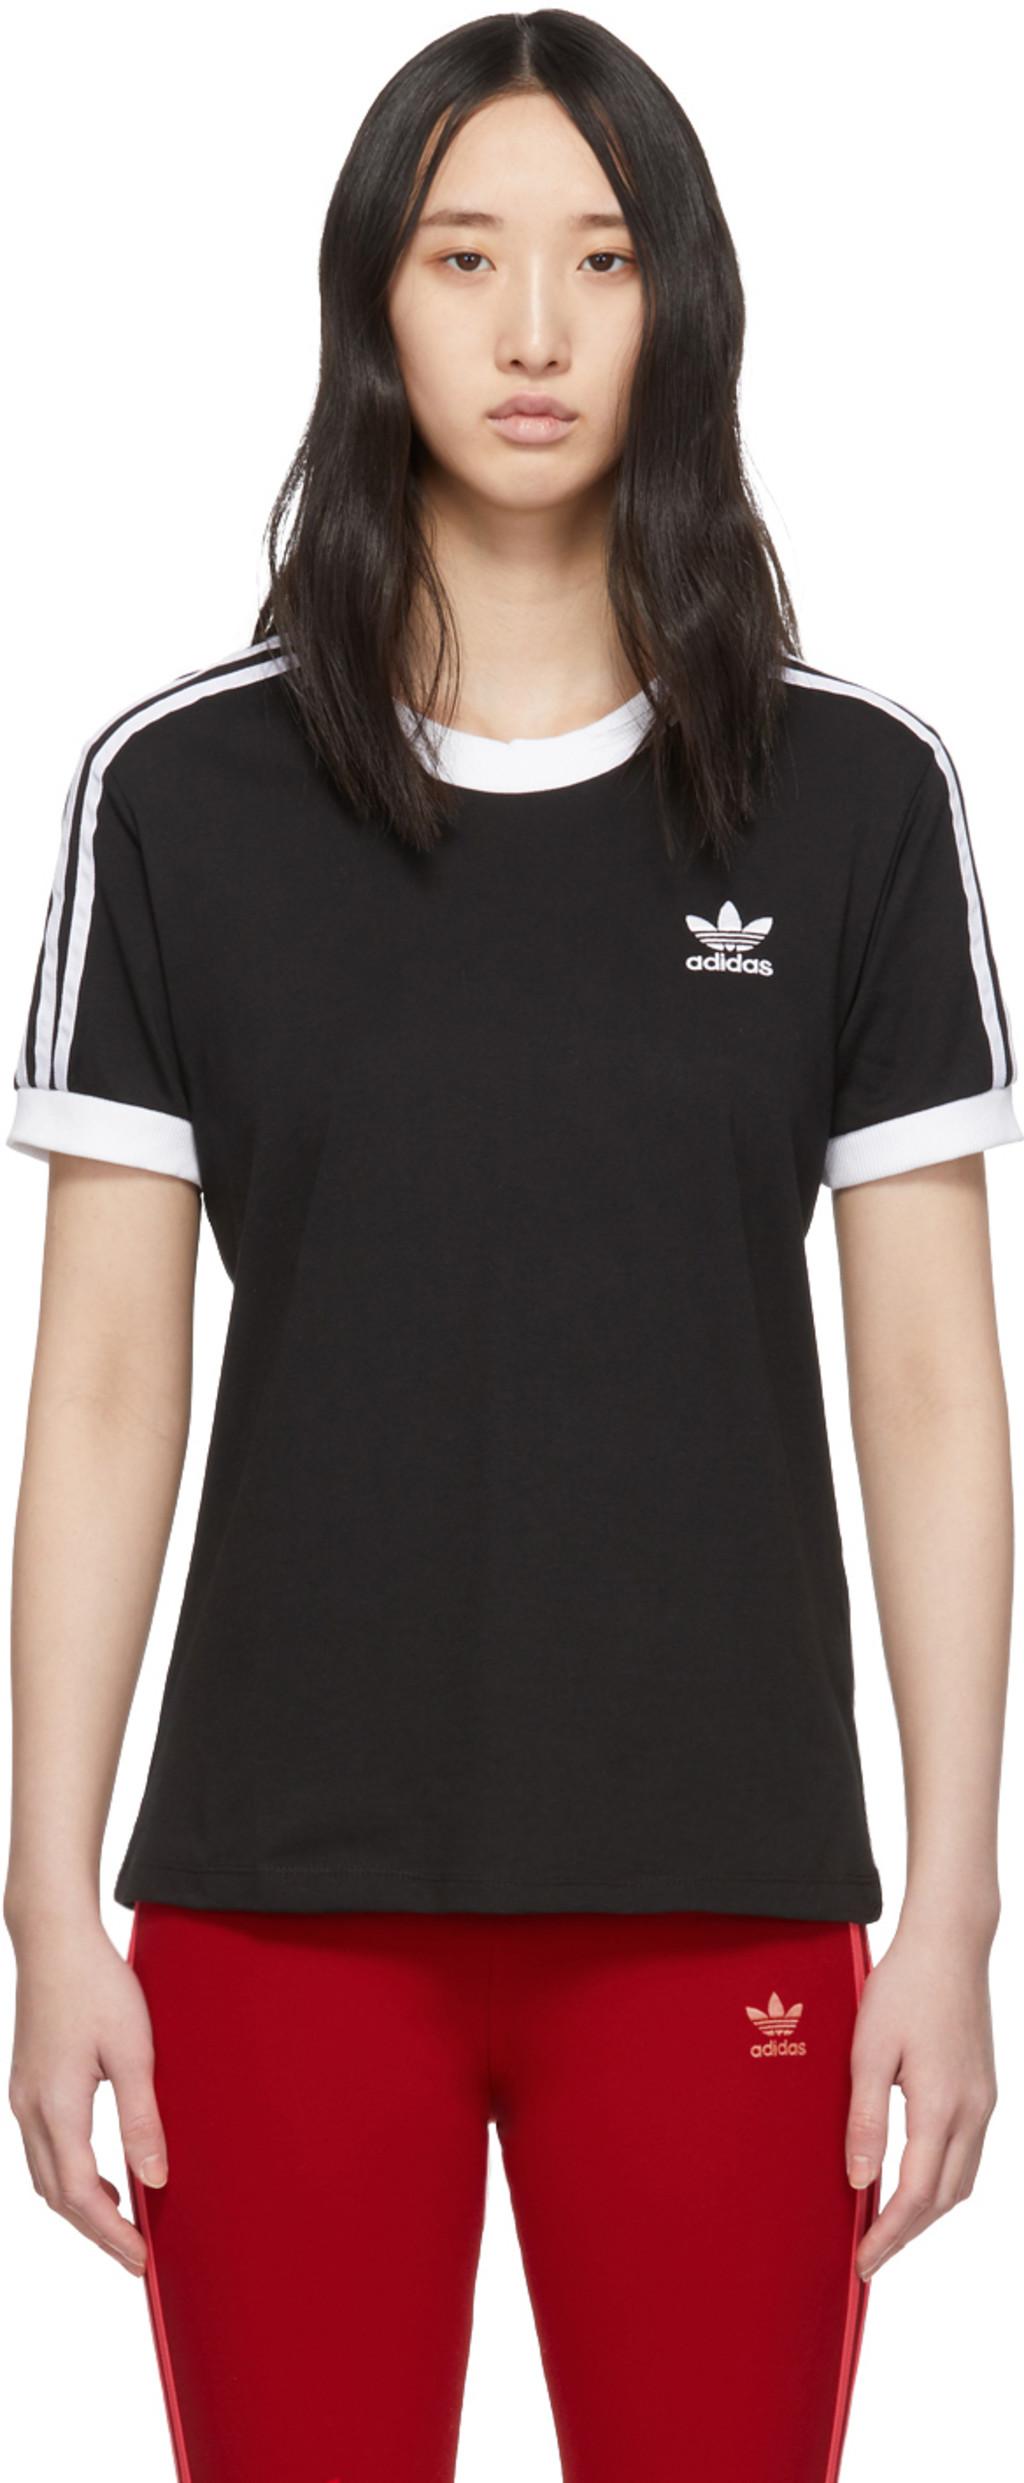 03739abc65 Black 3-Stripes T-Shirt